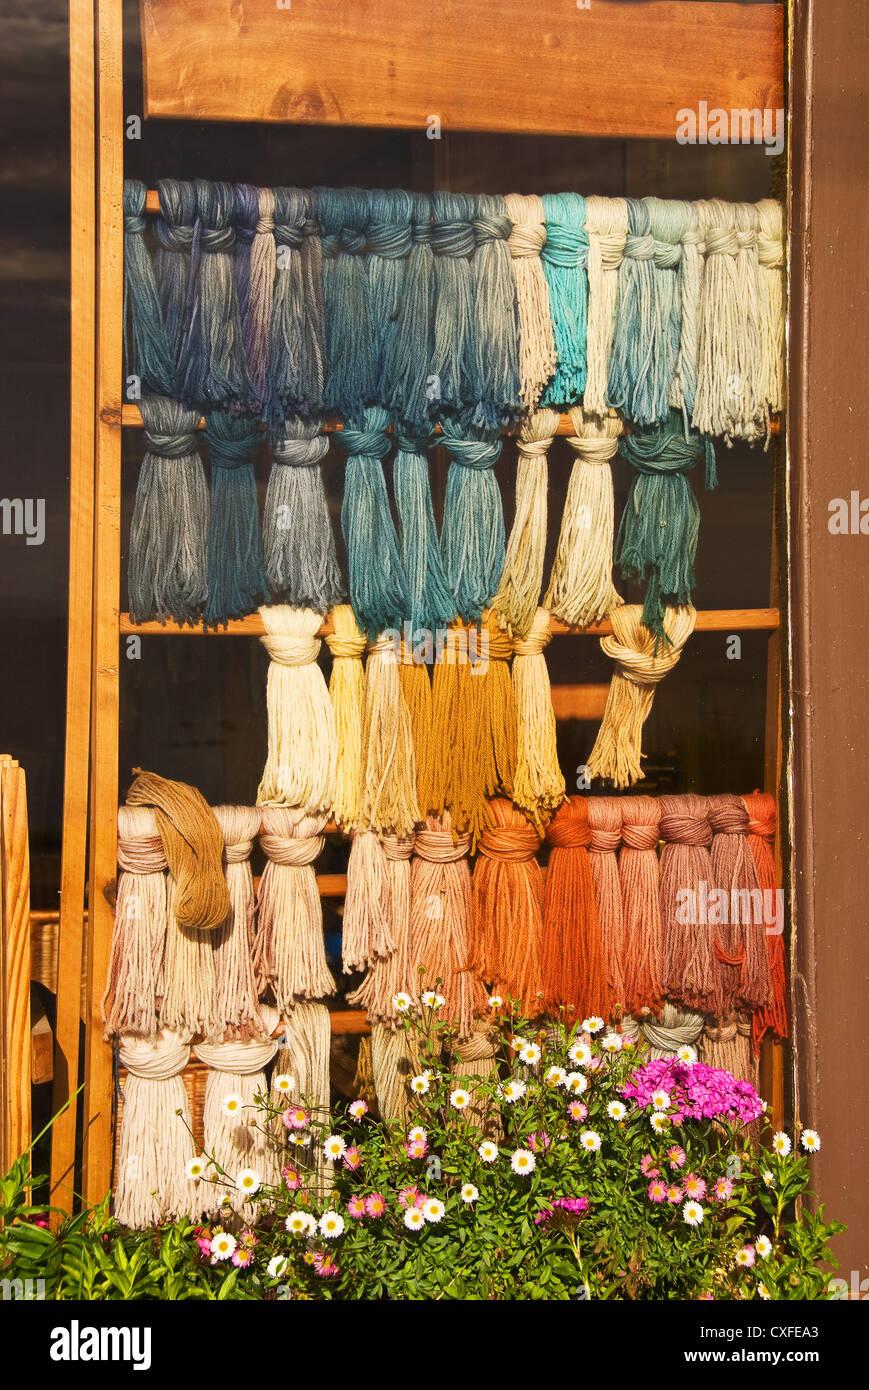 Elk198-3374v Chile, Fruitillar, handicraft, yarn - Stock Image